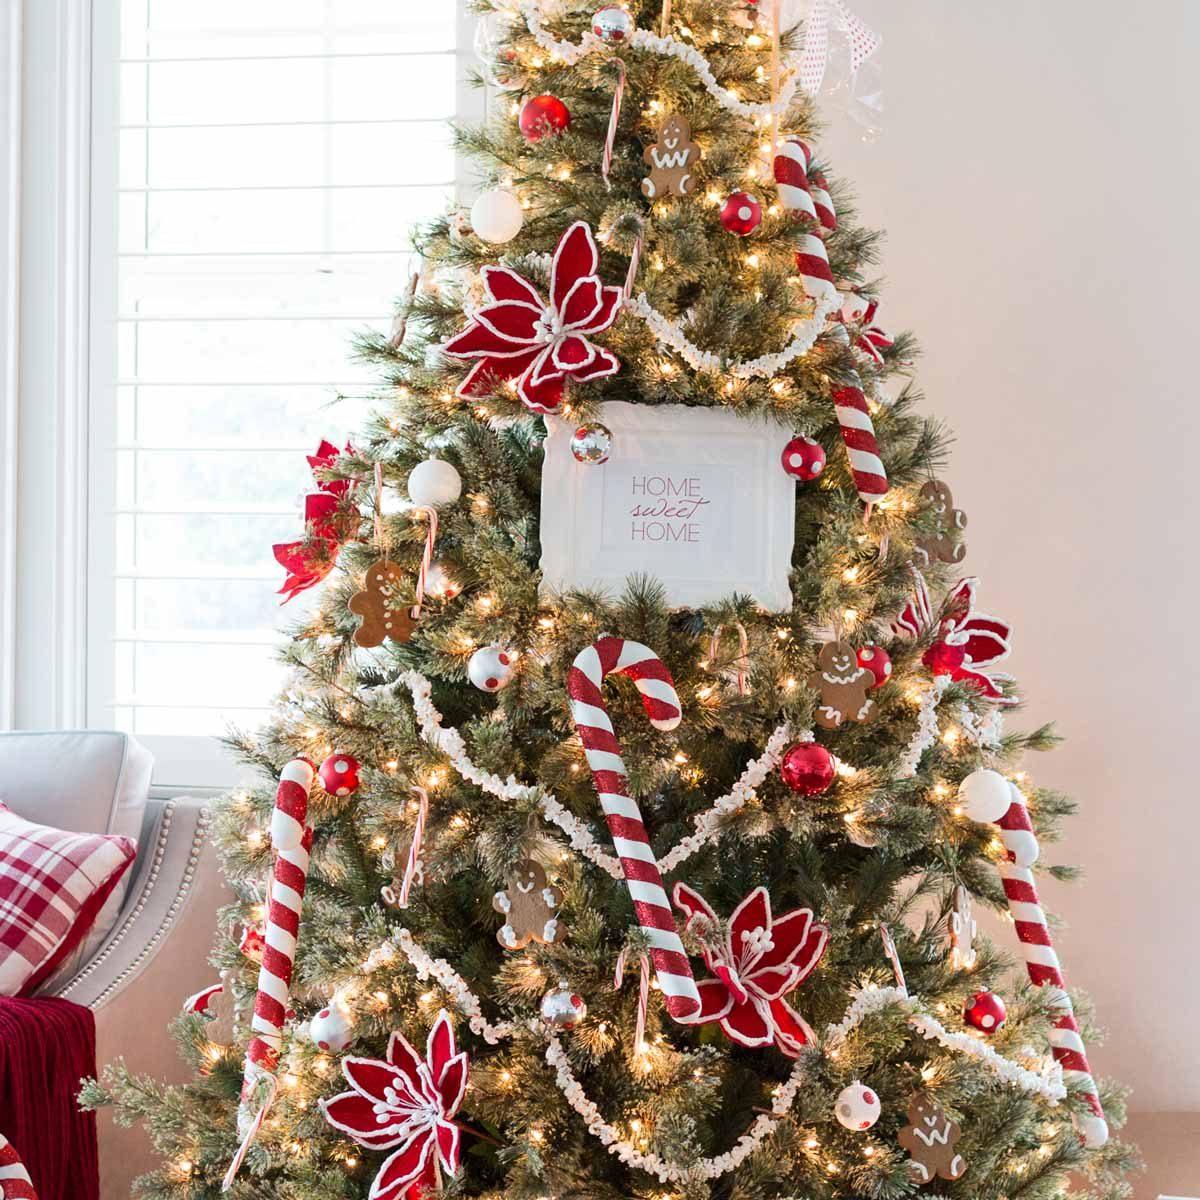 Christmas Tree Home Decorating Ideas: 100 Incredible Christmas Tree Decorating Ideas